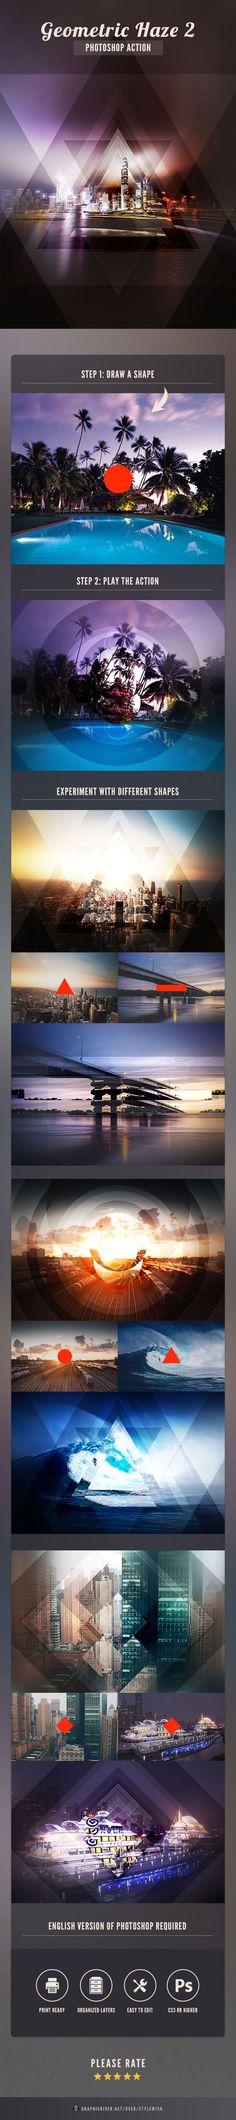 Geometric Haze 2 Photoshop Action. Download here: https://graphicriver.net/item/geometric-haze-2-photoshop-action/17279947?ref=ksioks